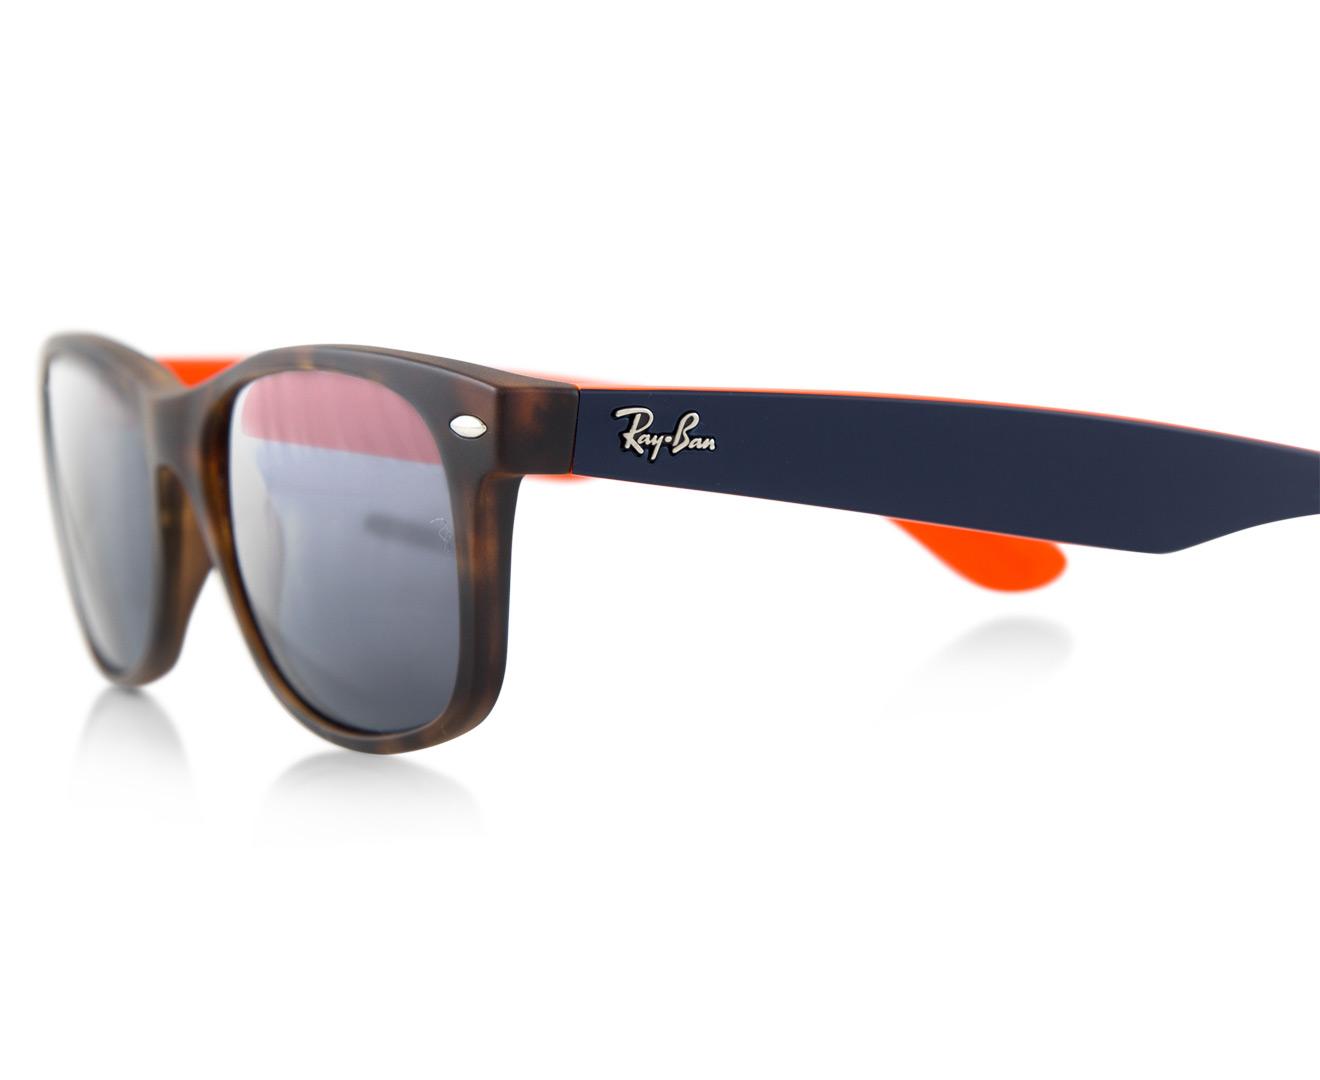 ... spain ray ban new wayfarer bicolour rb2132 6180r5 sunglasses tortoise  blue catch.au 2f85d 04e71 7abe86acbab6